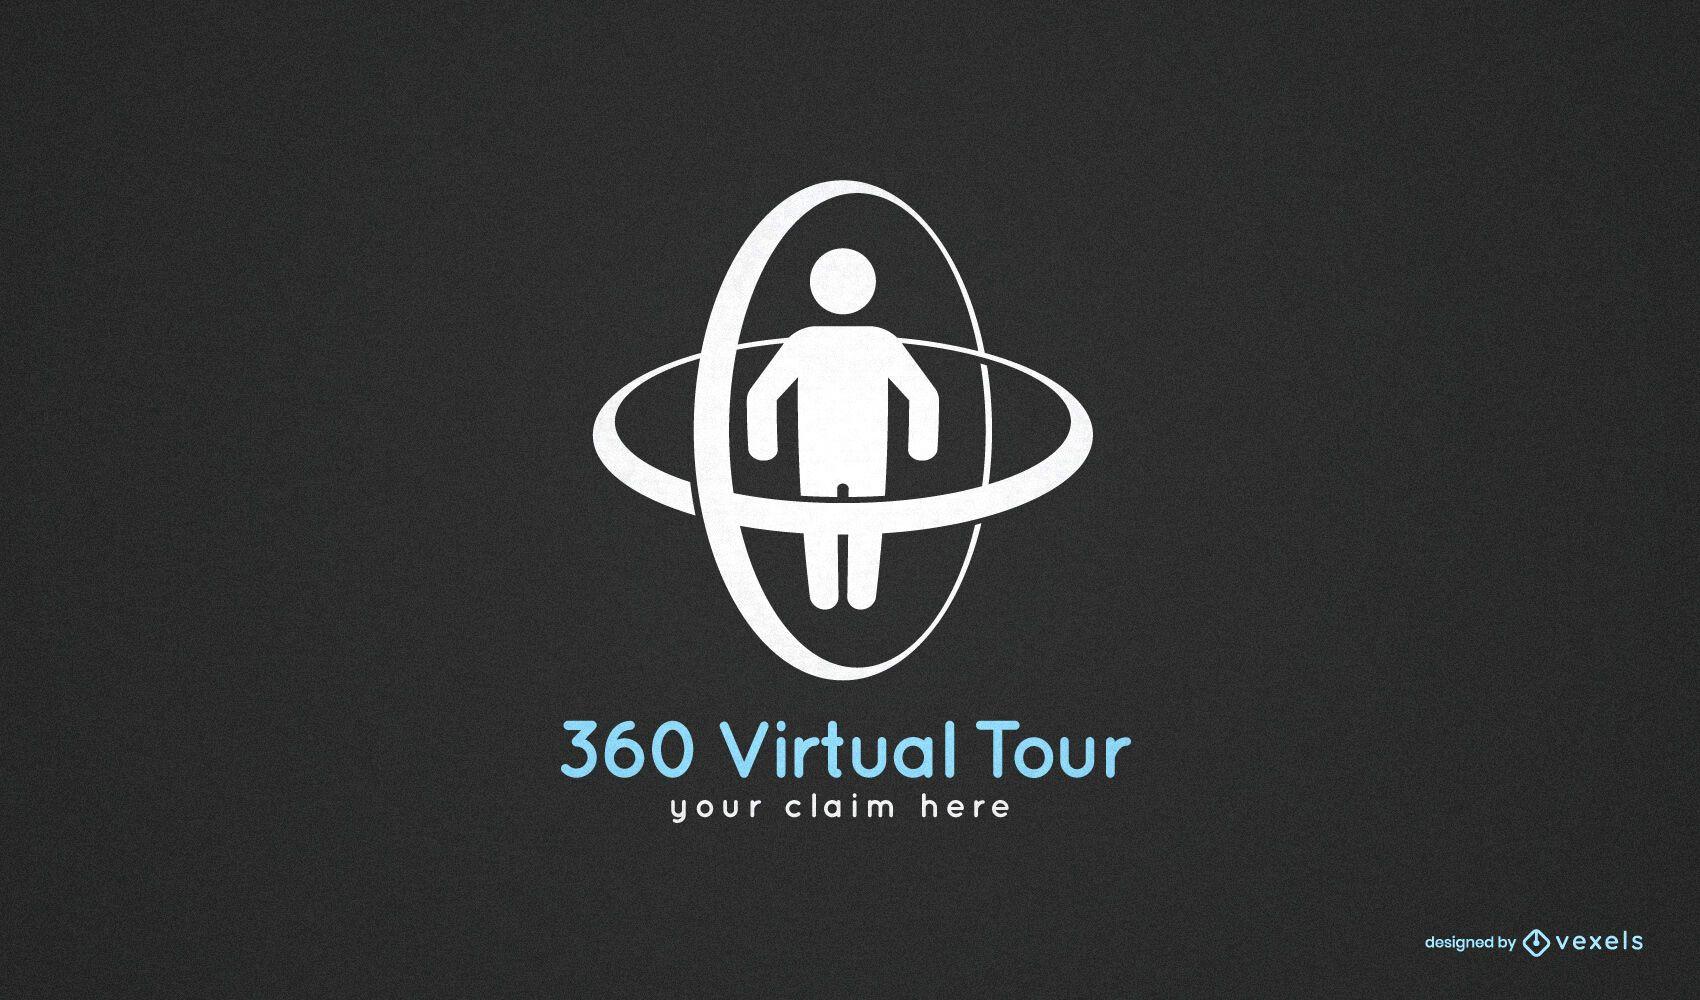 360 virtual tour logo template